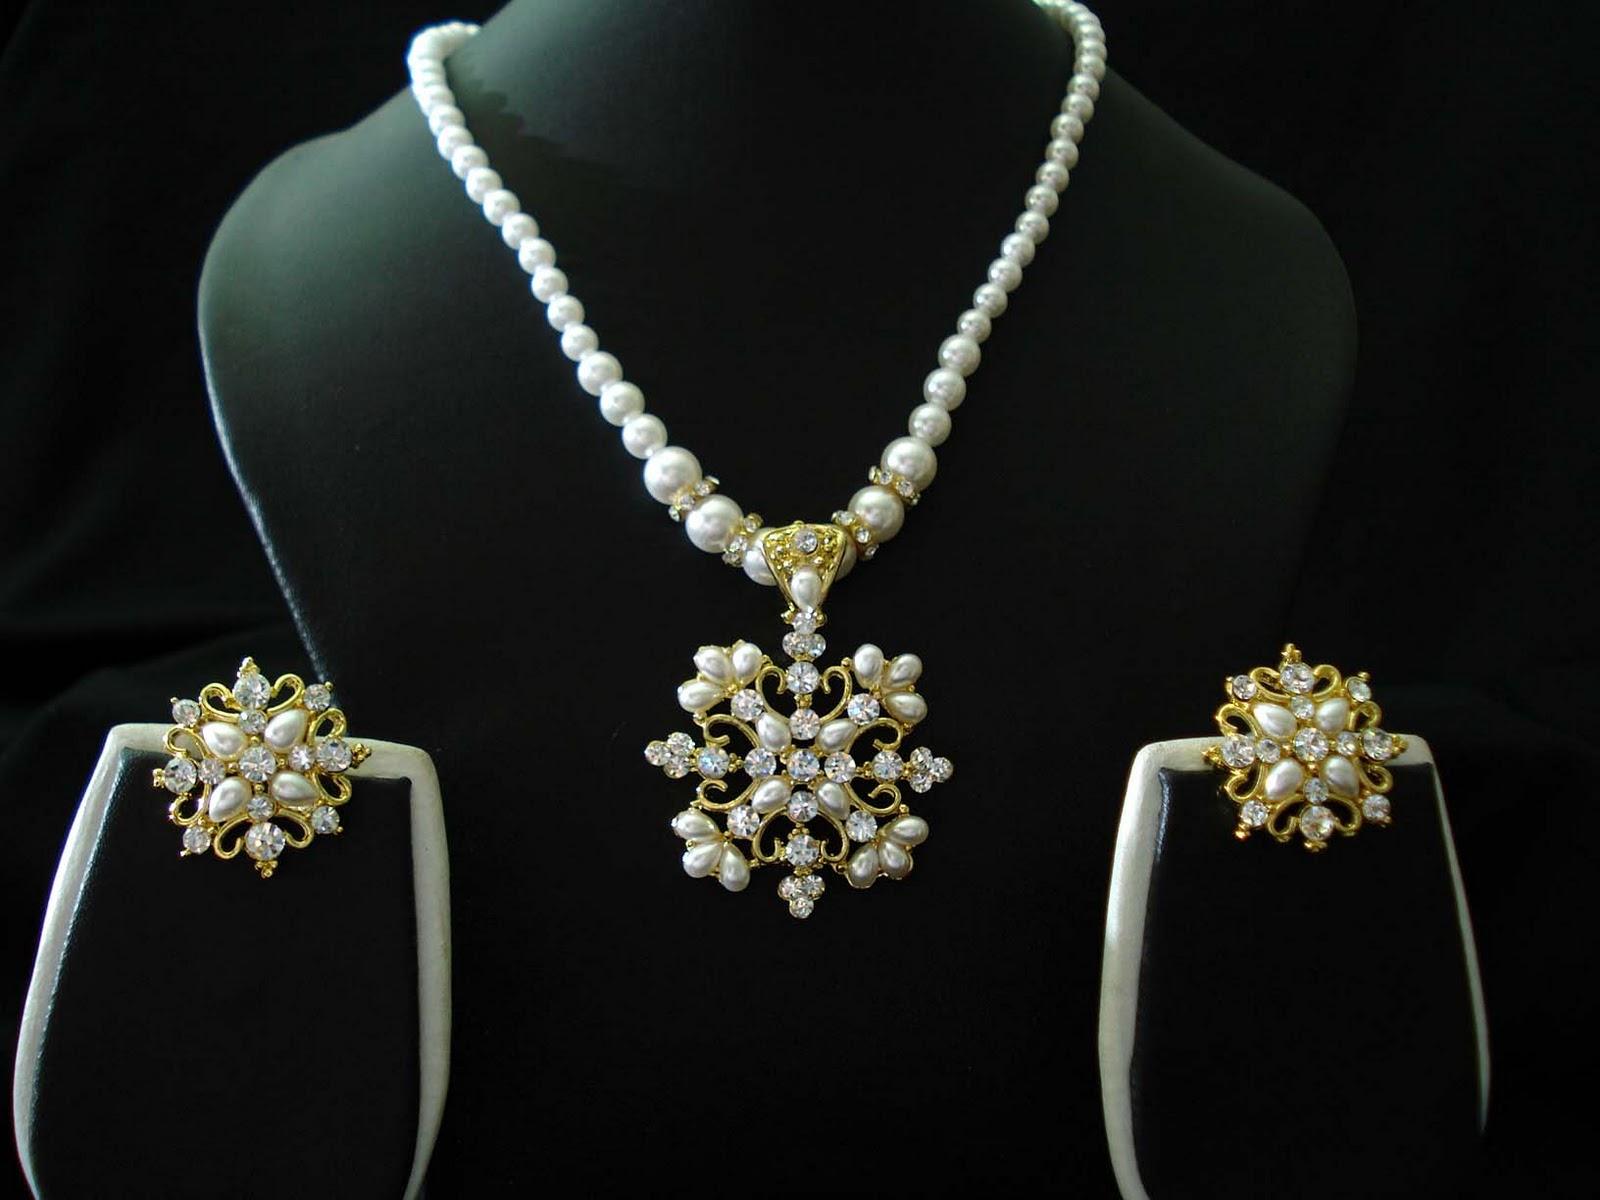 fine jewelry designersjewelry desgin sketches ideas 2014 neclkace ring